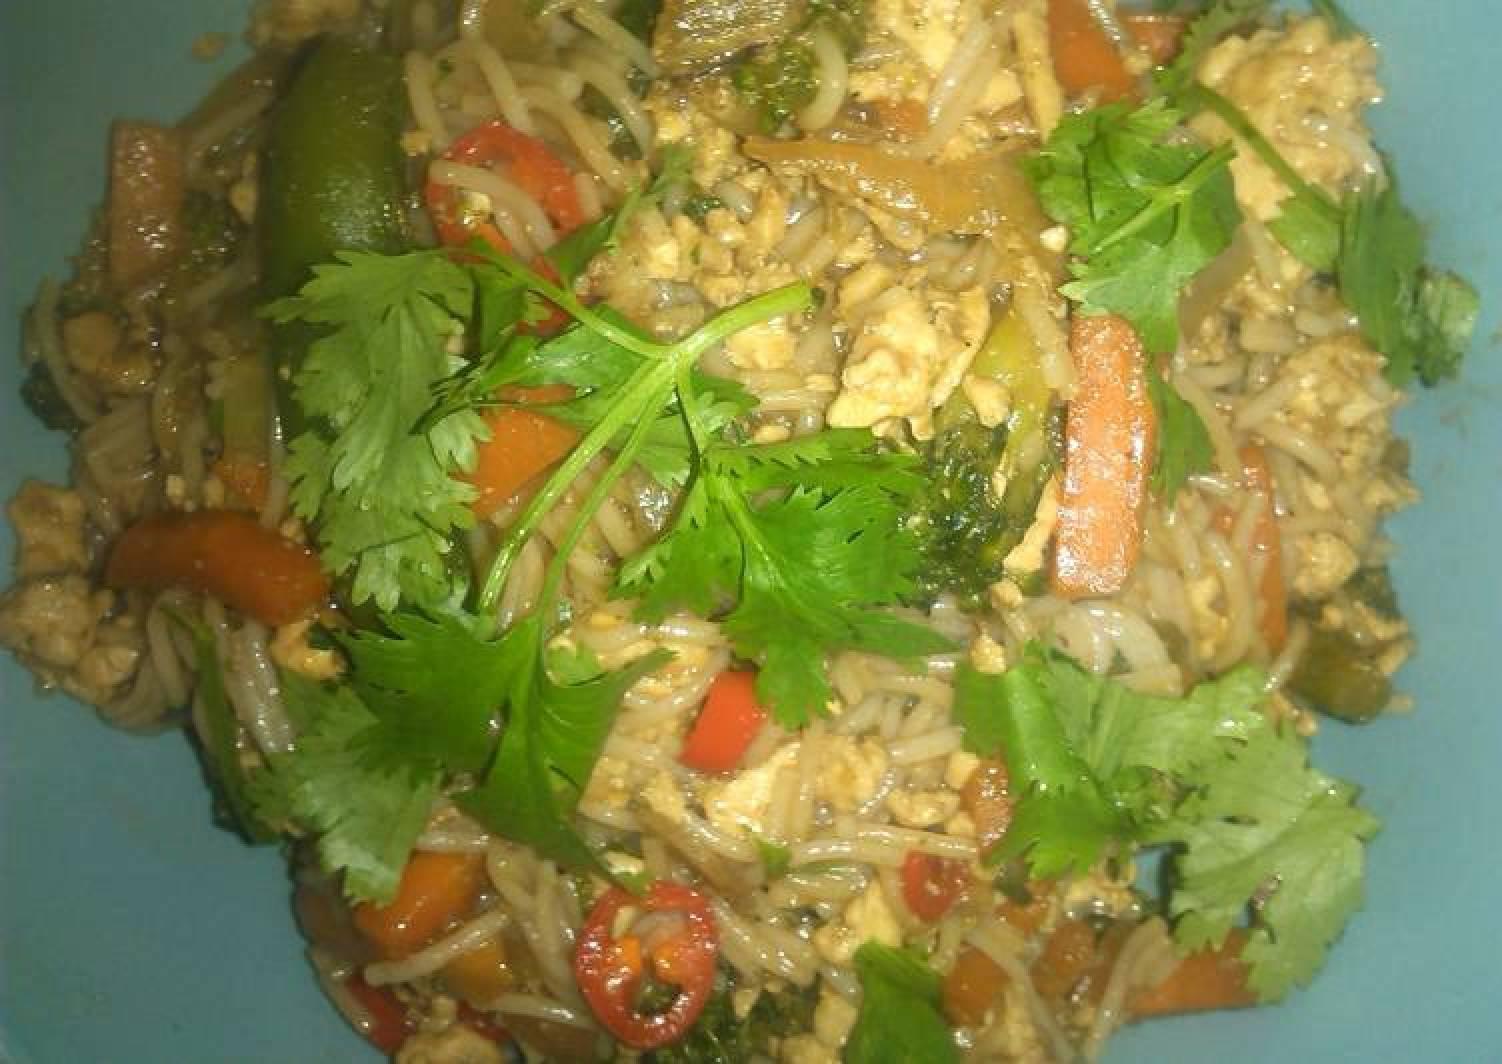 Turkey noodle stir-fry